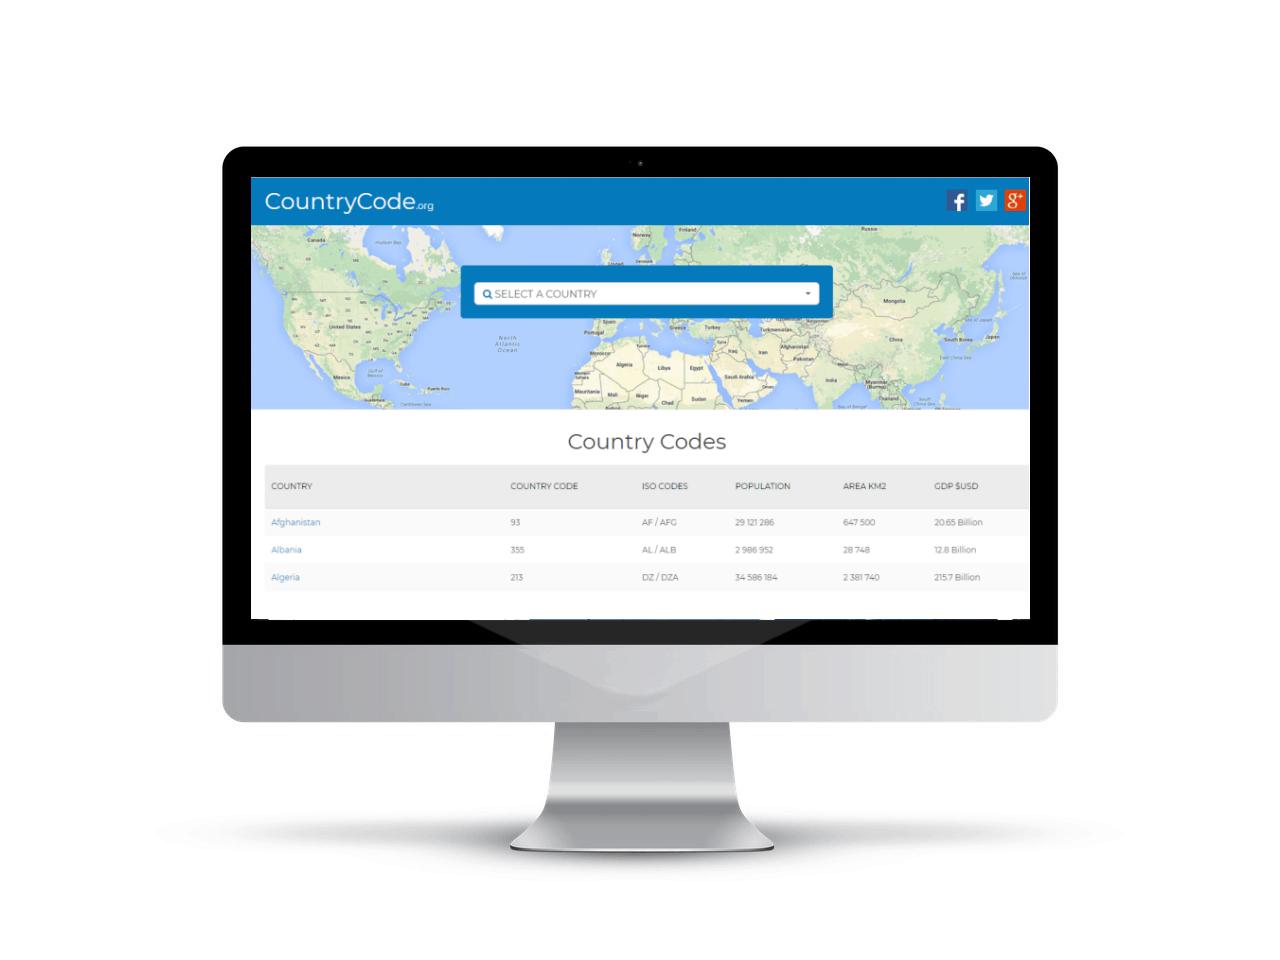 countrycode.org